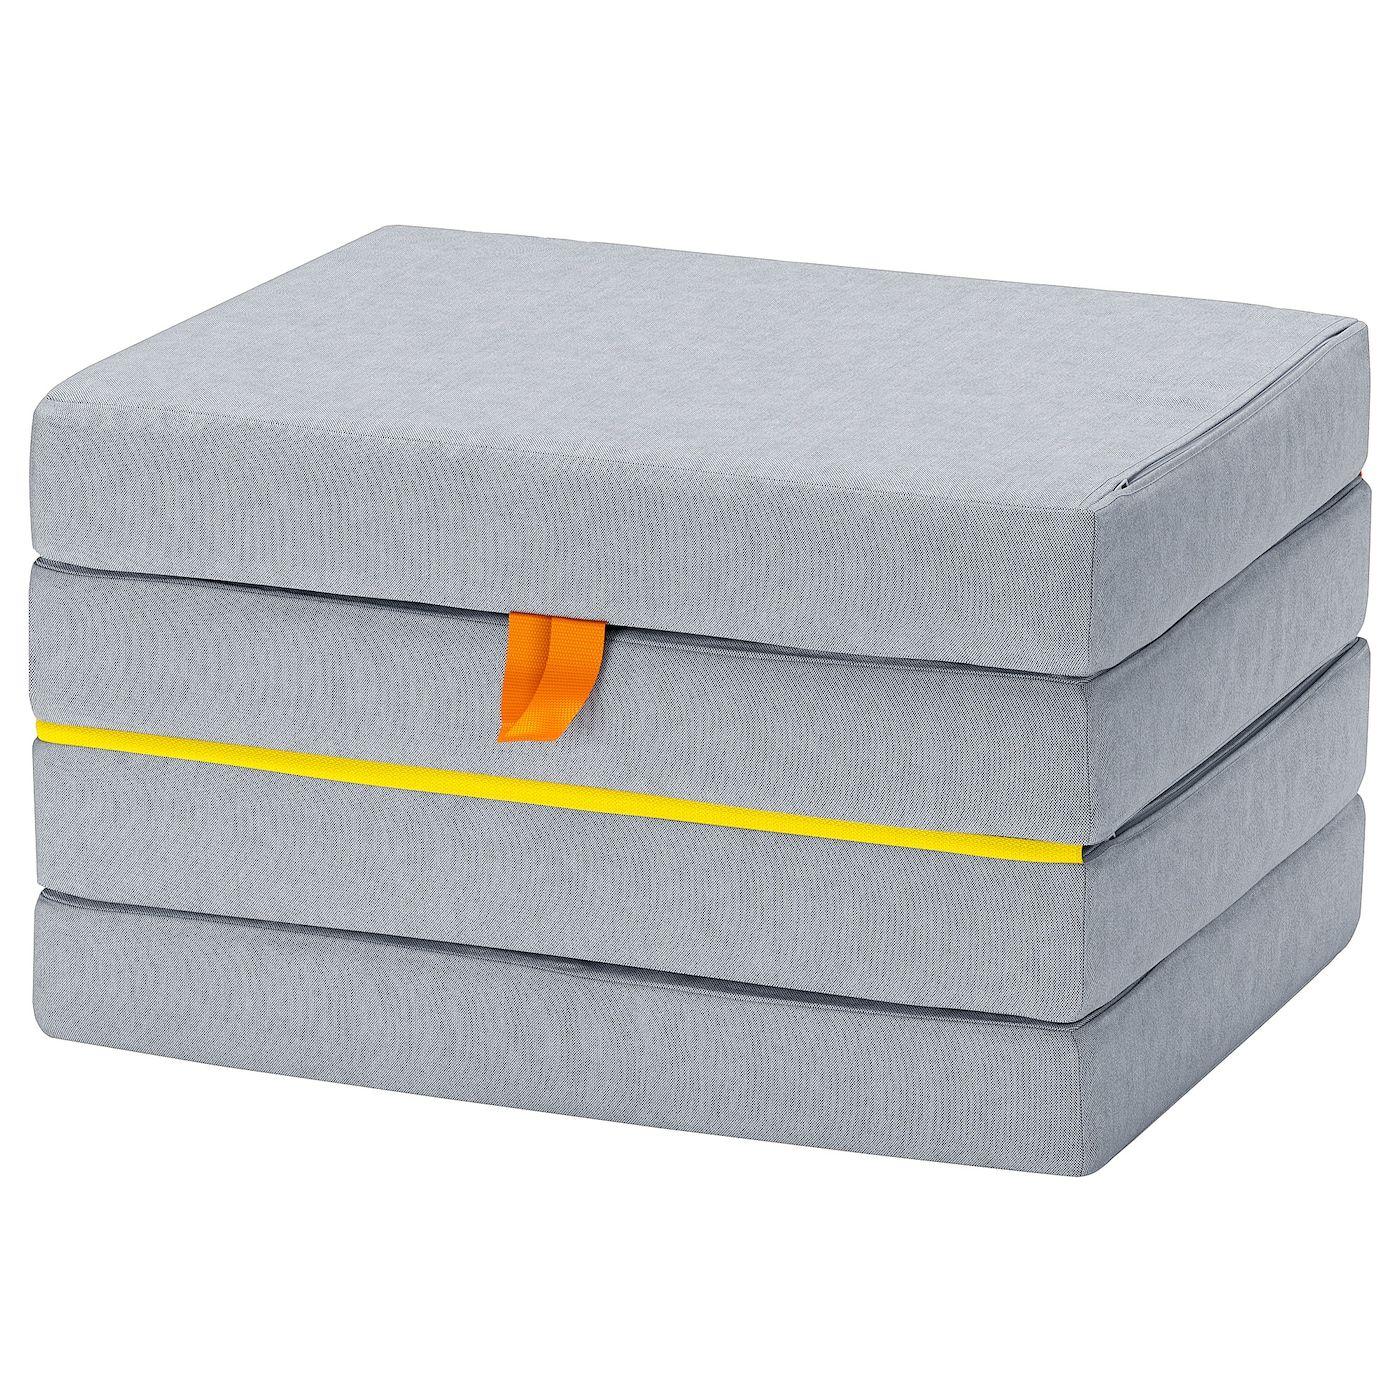 Slakt Mattress Folding In 2020 Mattress Ikea Time To Tidy Up